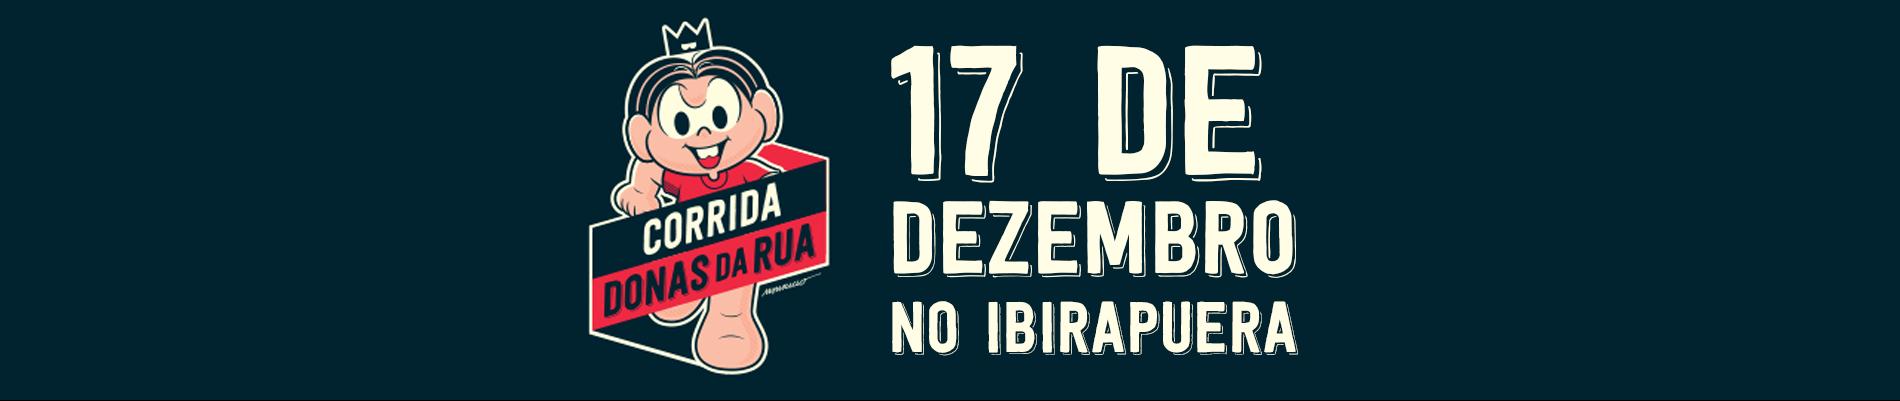 CORRIDA DONAS DA RUA - Imagem de topo